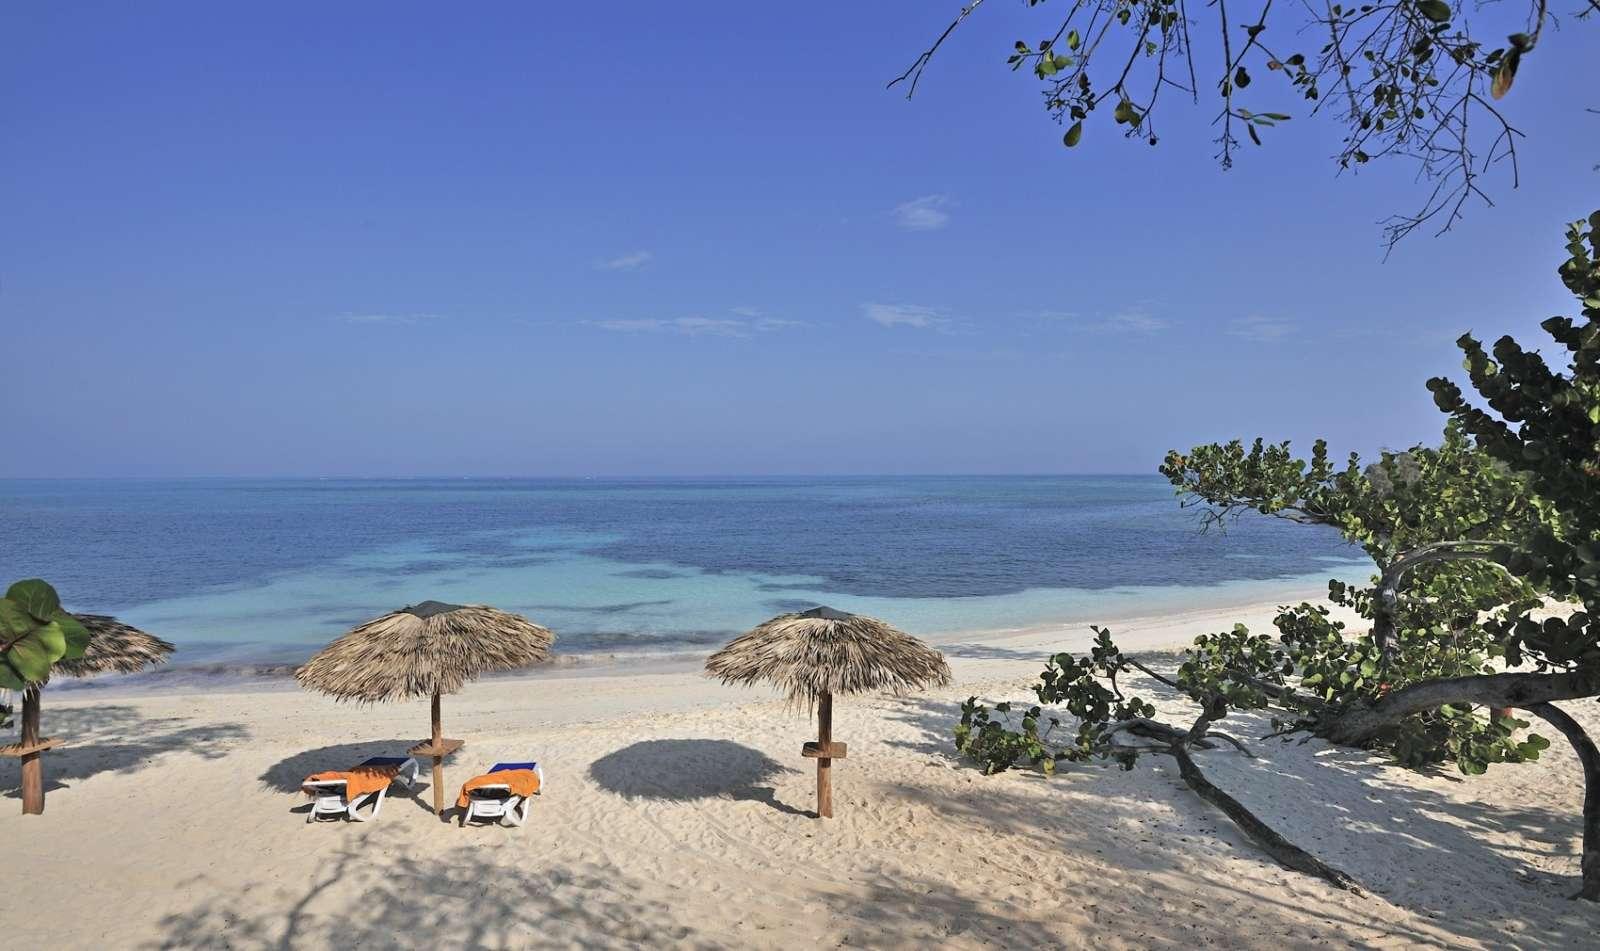 Secluded beach at Paradisus Rio de Oro